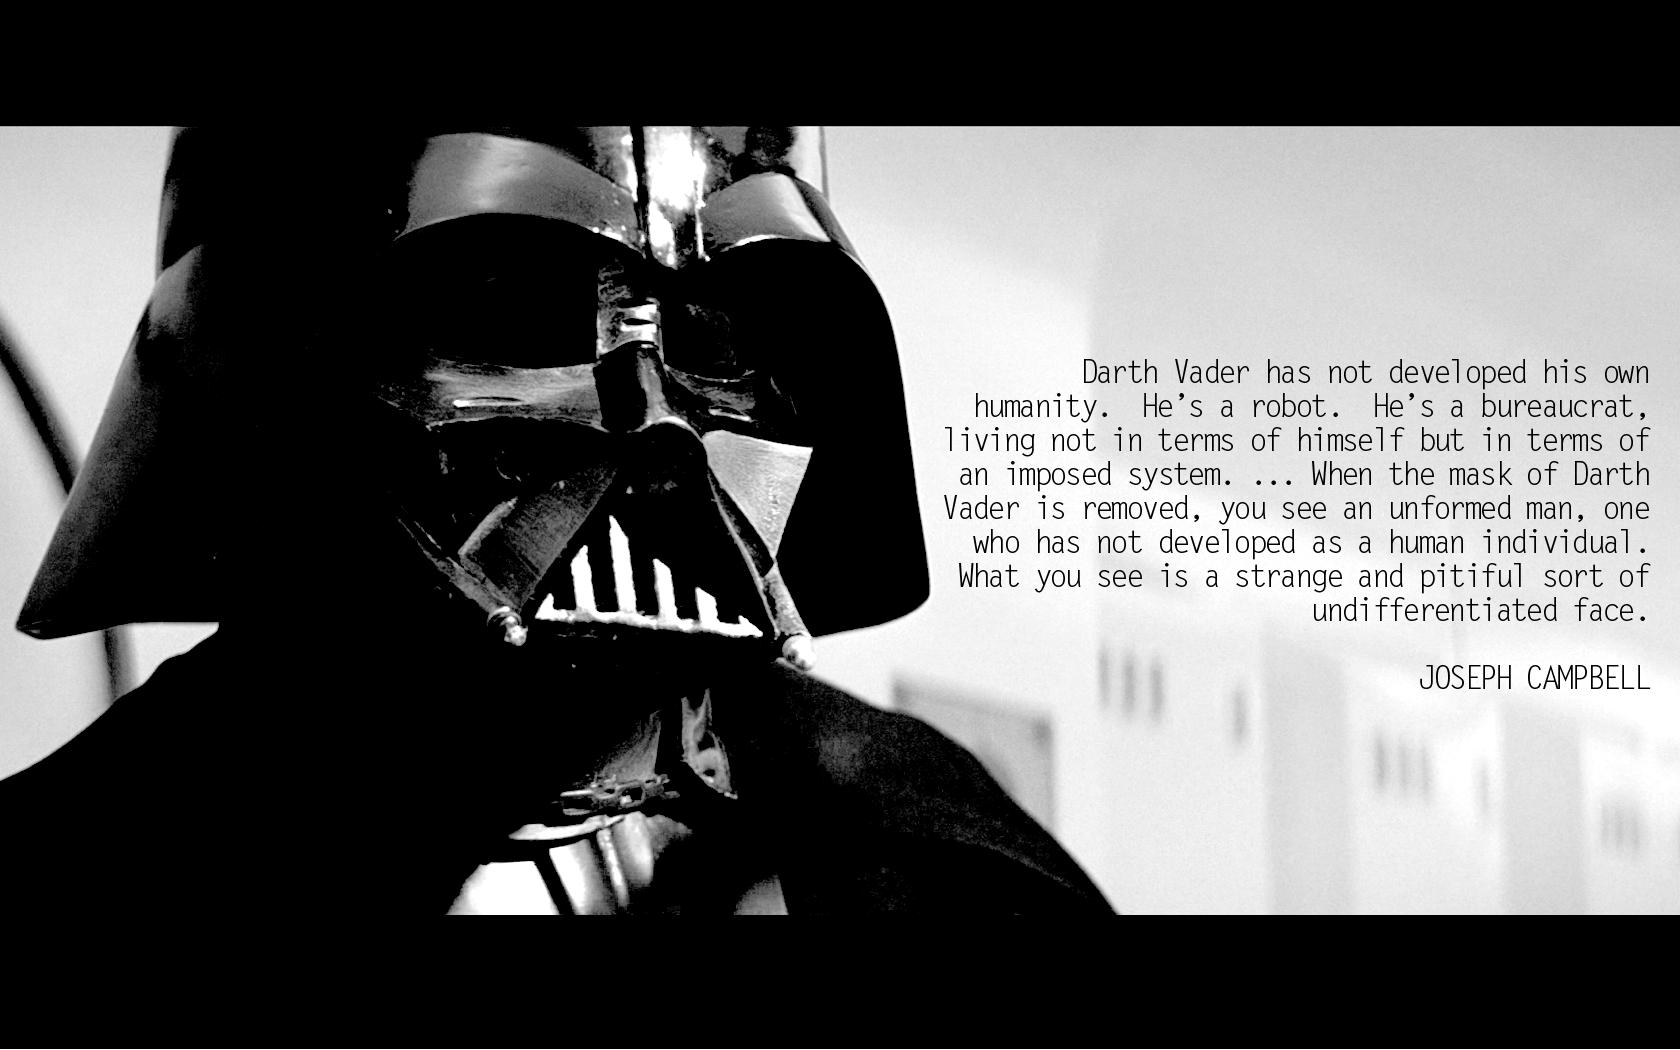 Pin By Motivre On English Teacher Stuff Star Wars Quotes Star Wars Quotes Darth Vader Star Wars Images